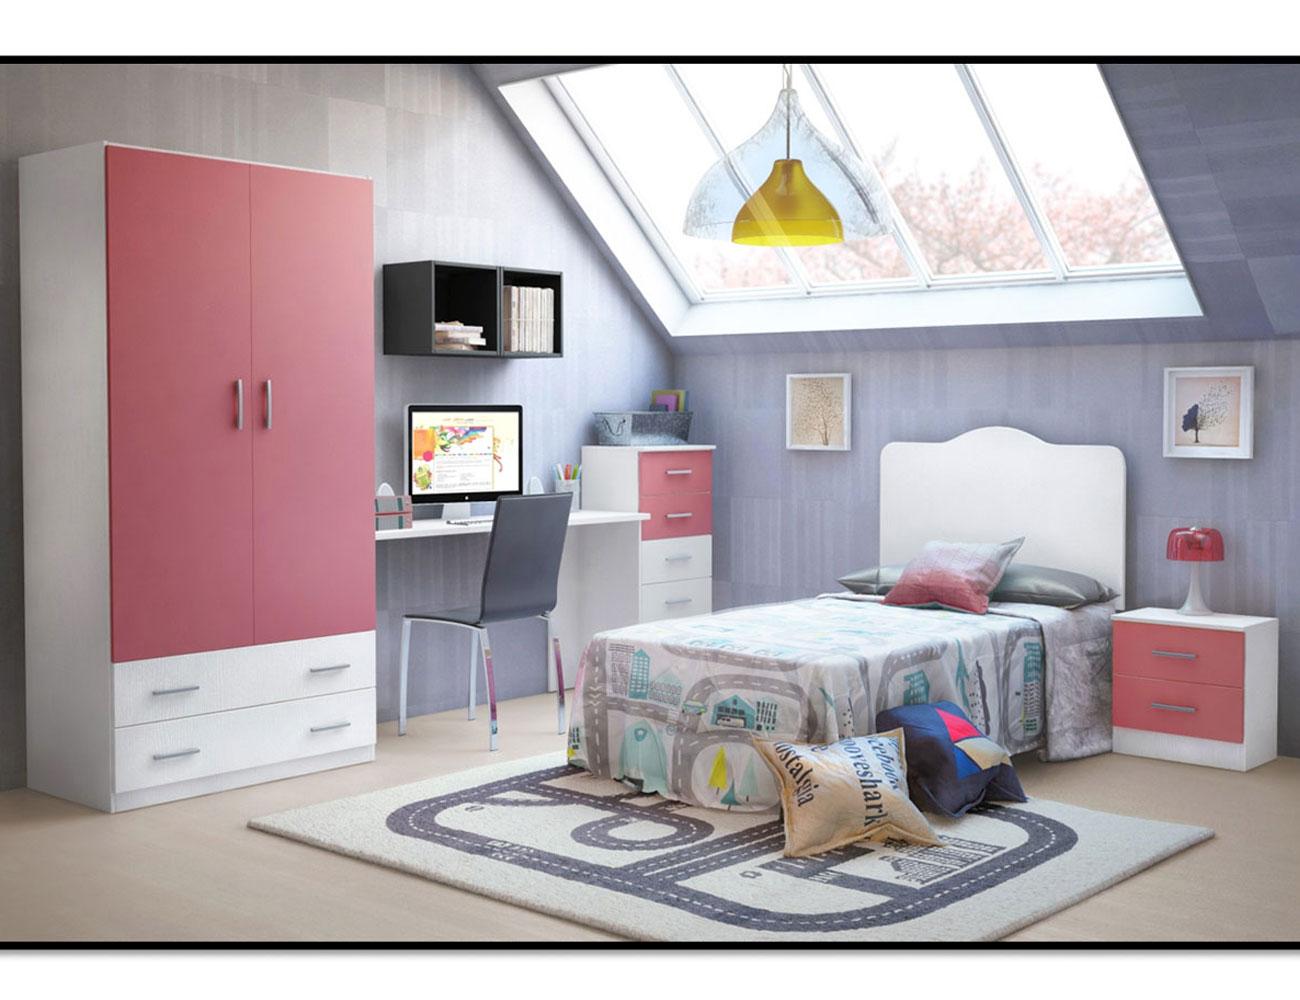 06 dormitorio juvenil1